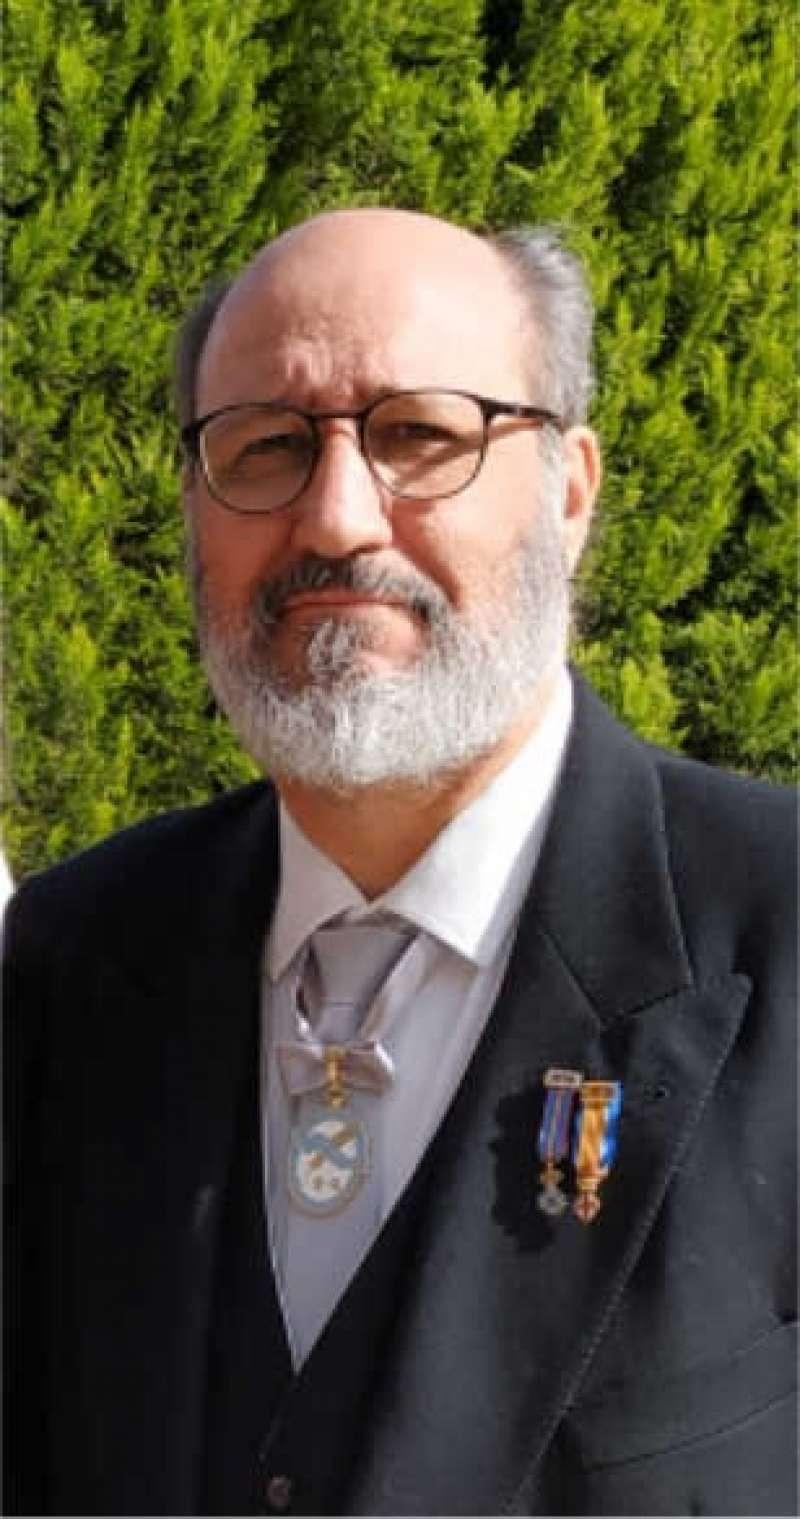 Juan Benito Manzanares